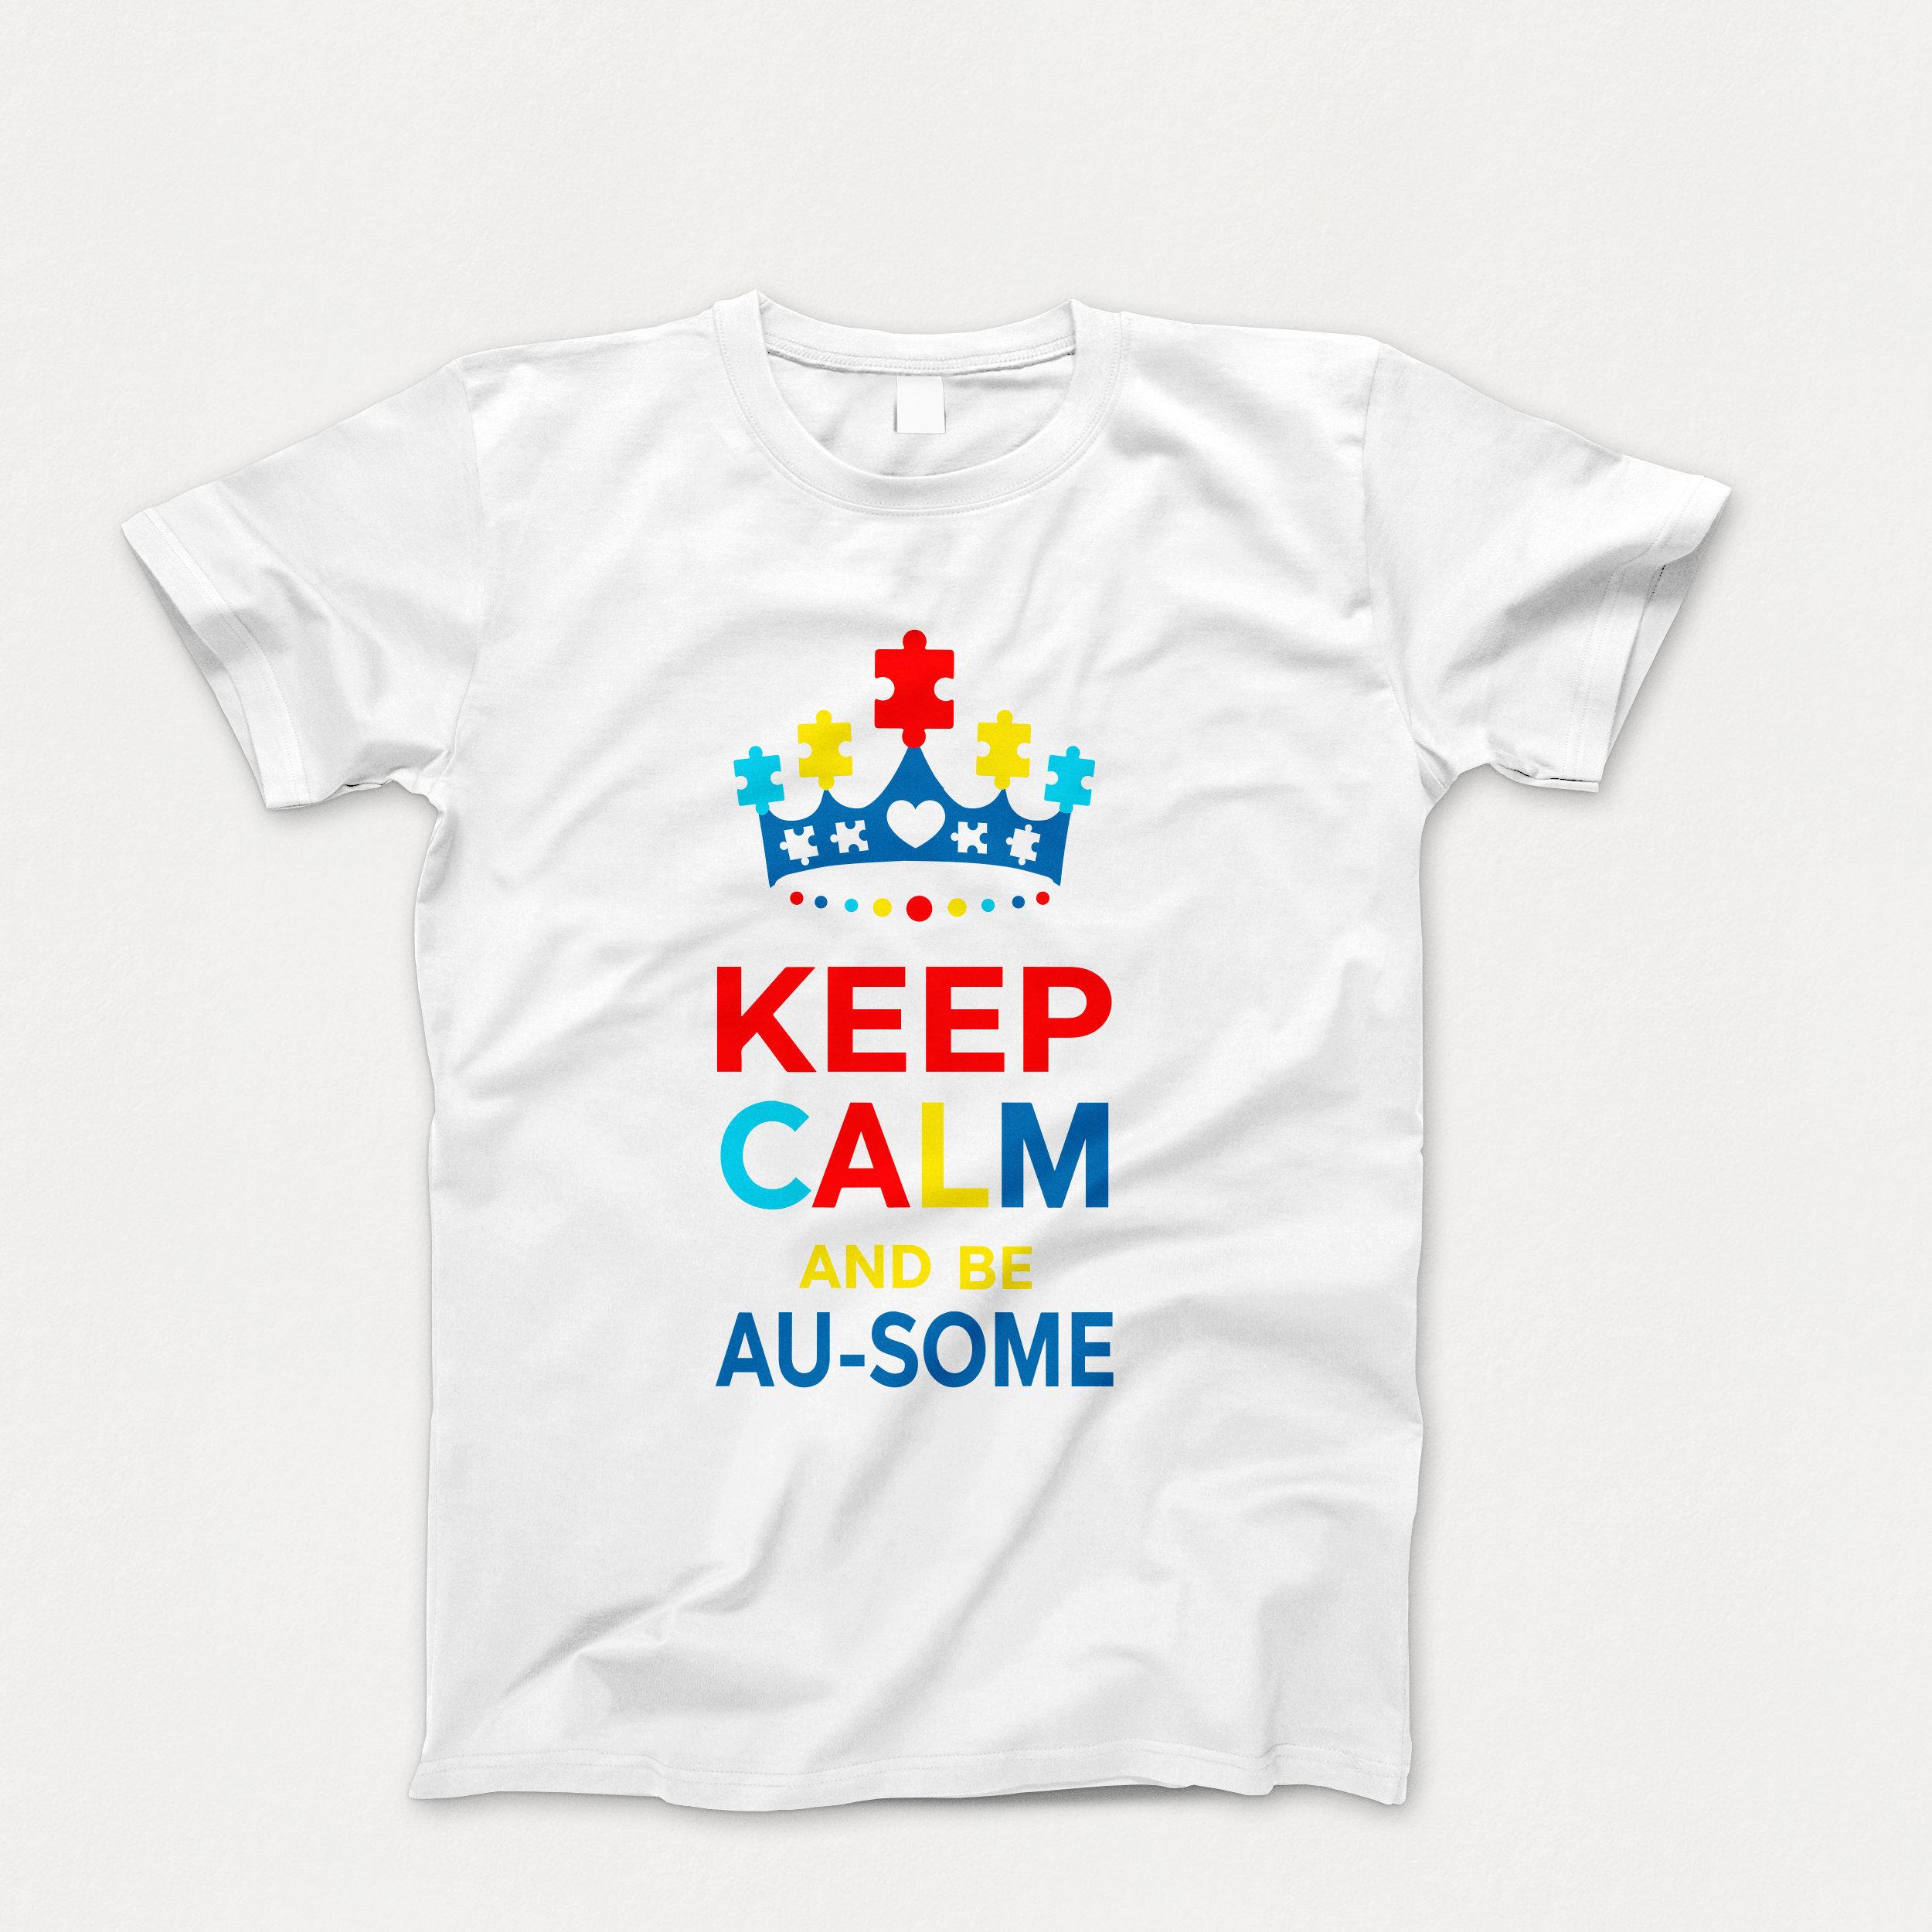 6320ae290 Autism Keep Calm and Be Au-some Parent T-shirt Autism Mom T-shirt ...